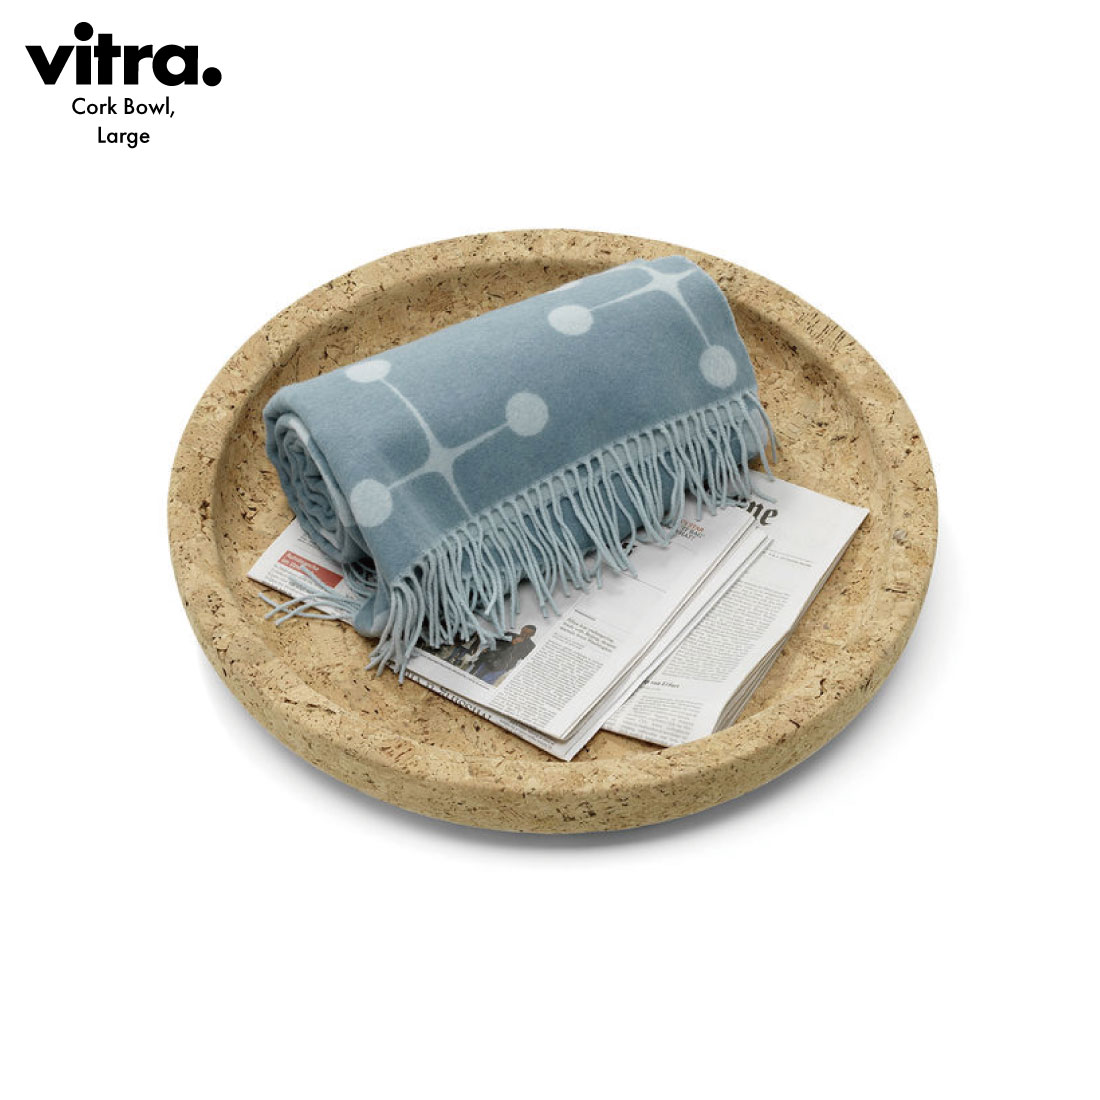 【Vitra/ヴィトラ】Cork Bowl,Large/コルクボウル/ラージ/コルク/オブジェ/収納/インテリア/ジャスパー・モリソン/Jasper Morrison/